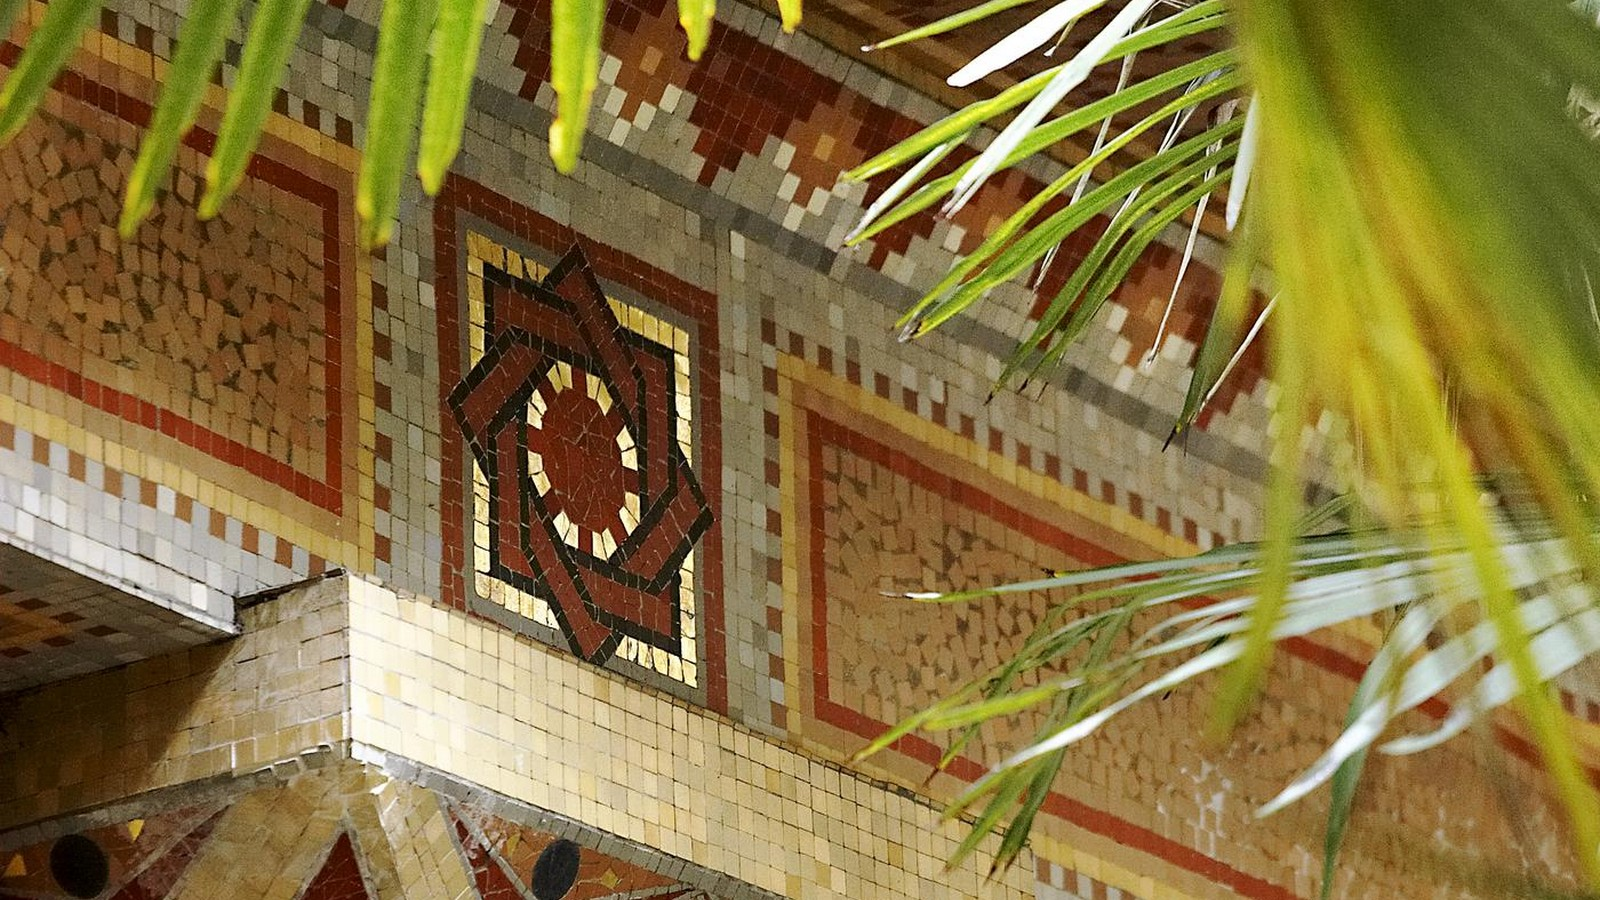 Mosaic detailing at the patio.